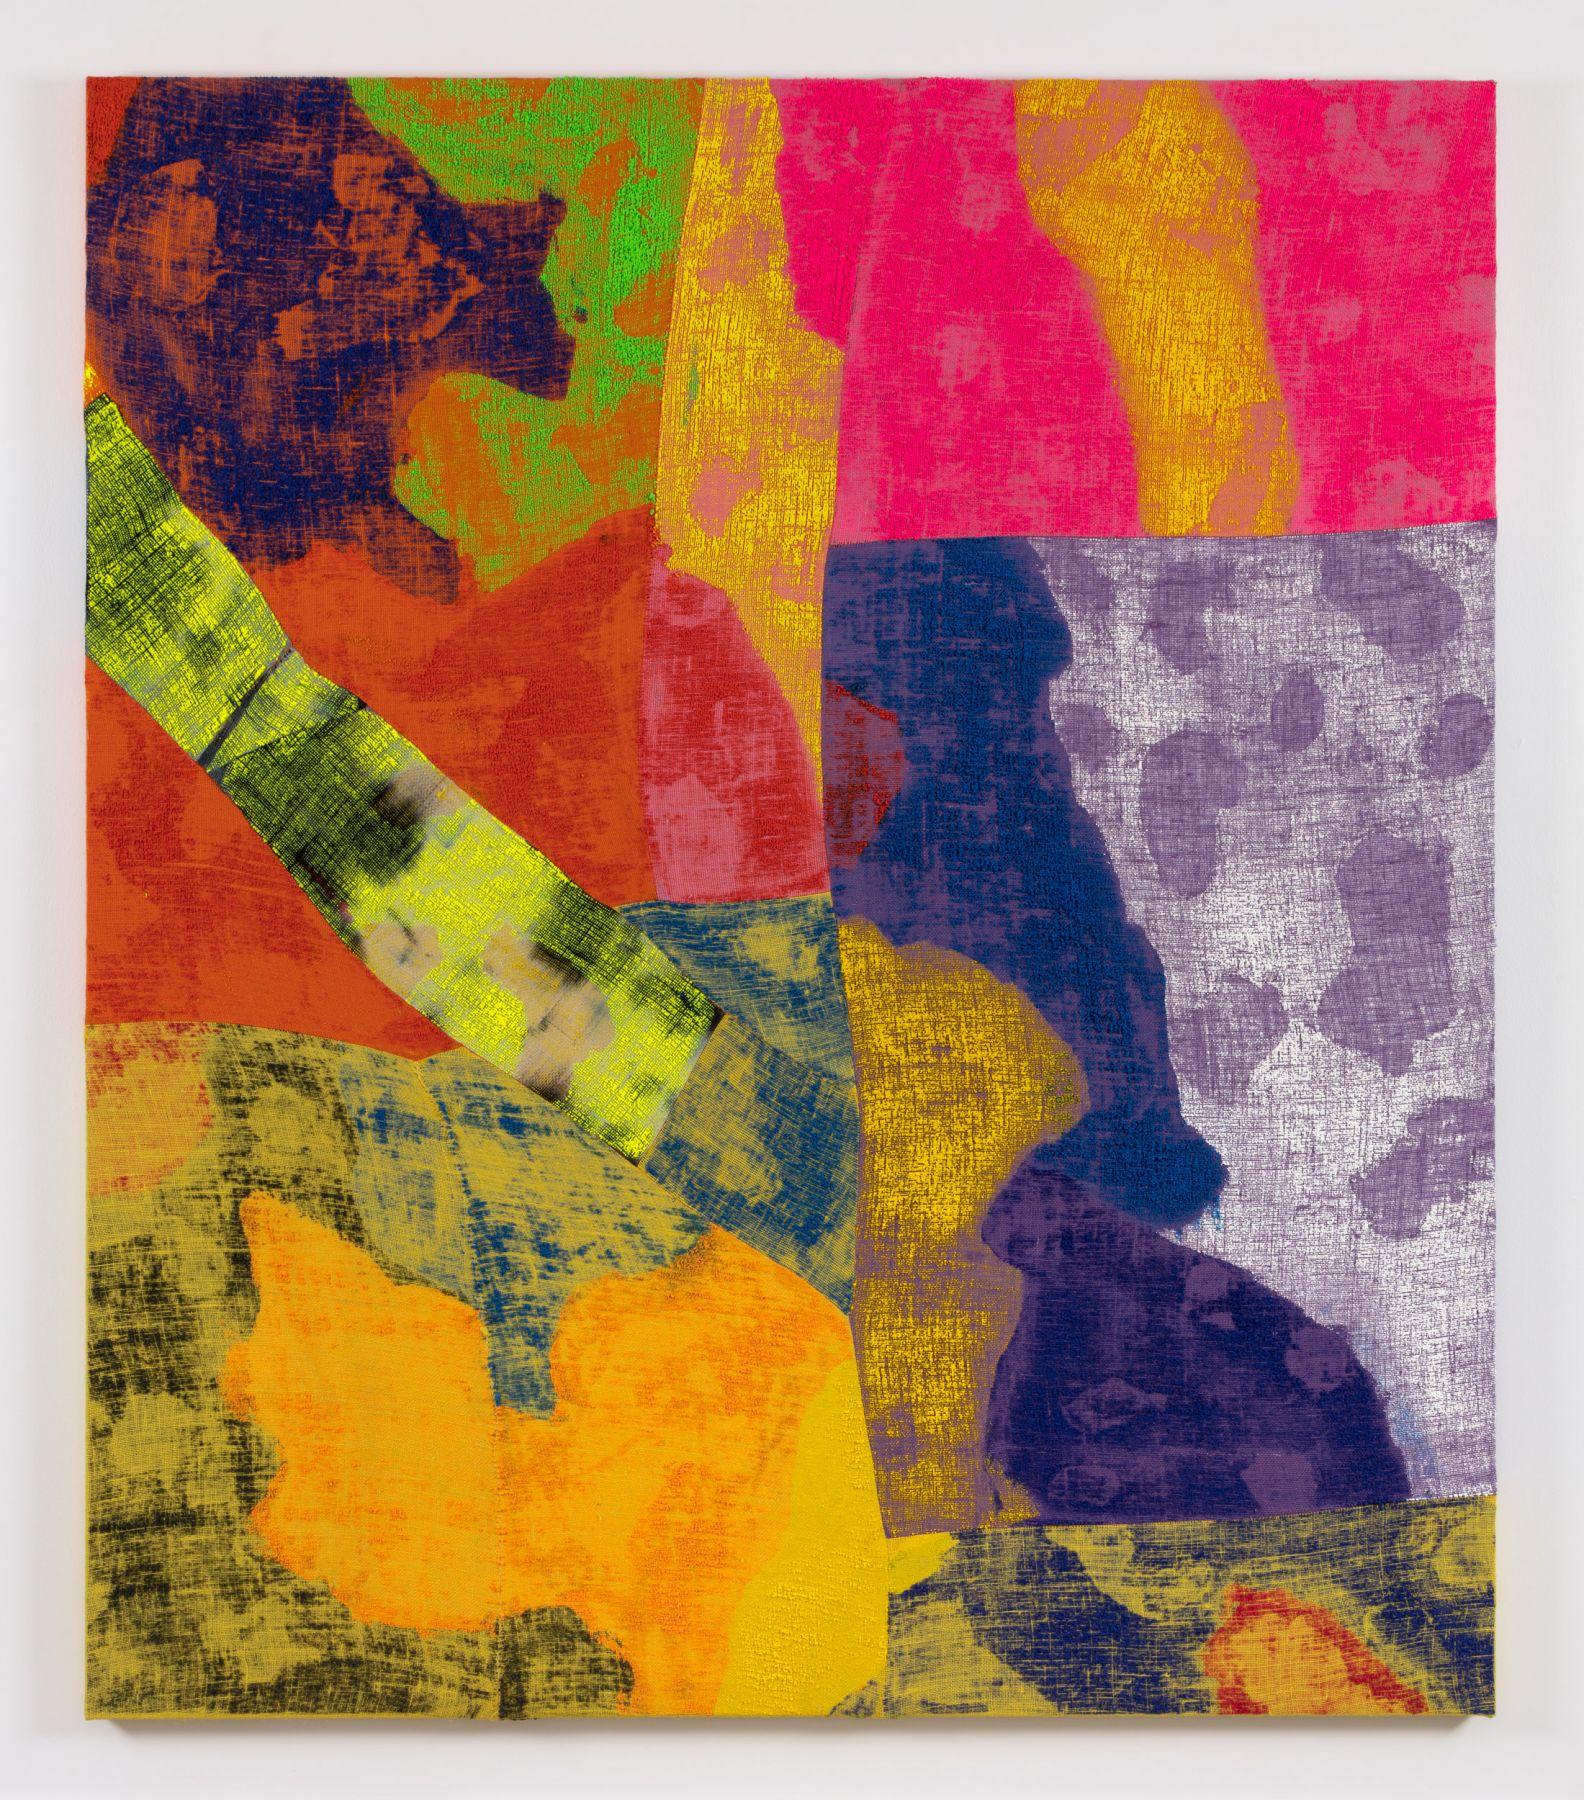 a multicolored acrylic work on burlap